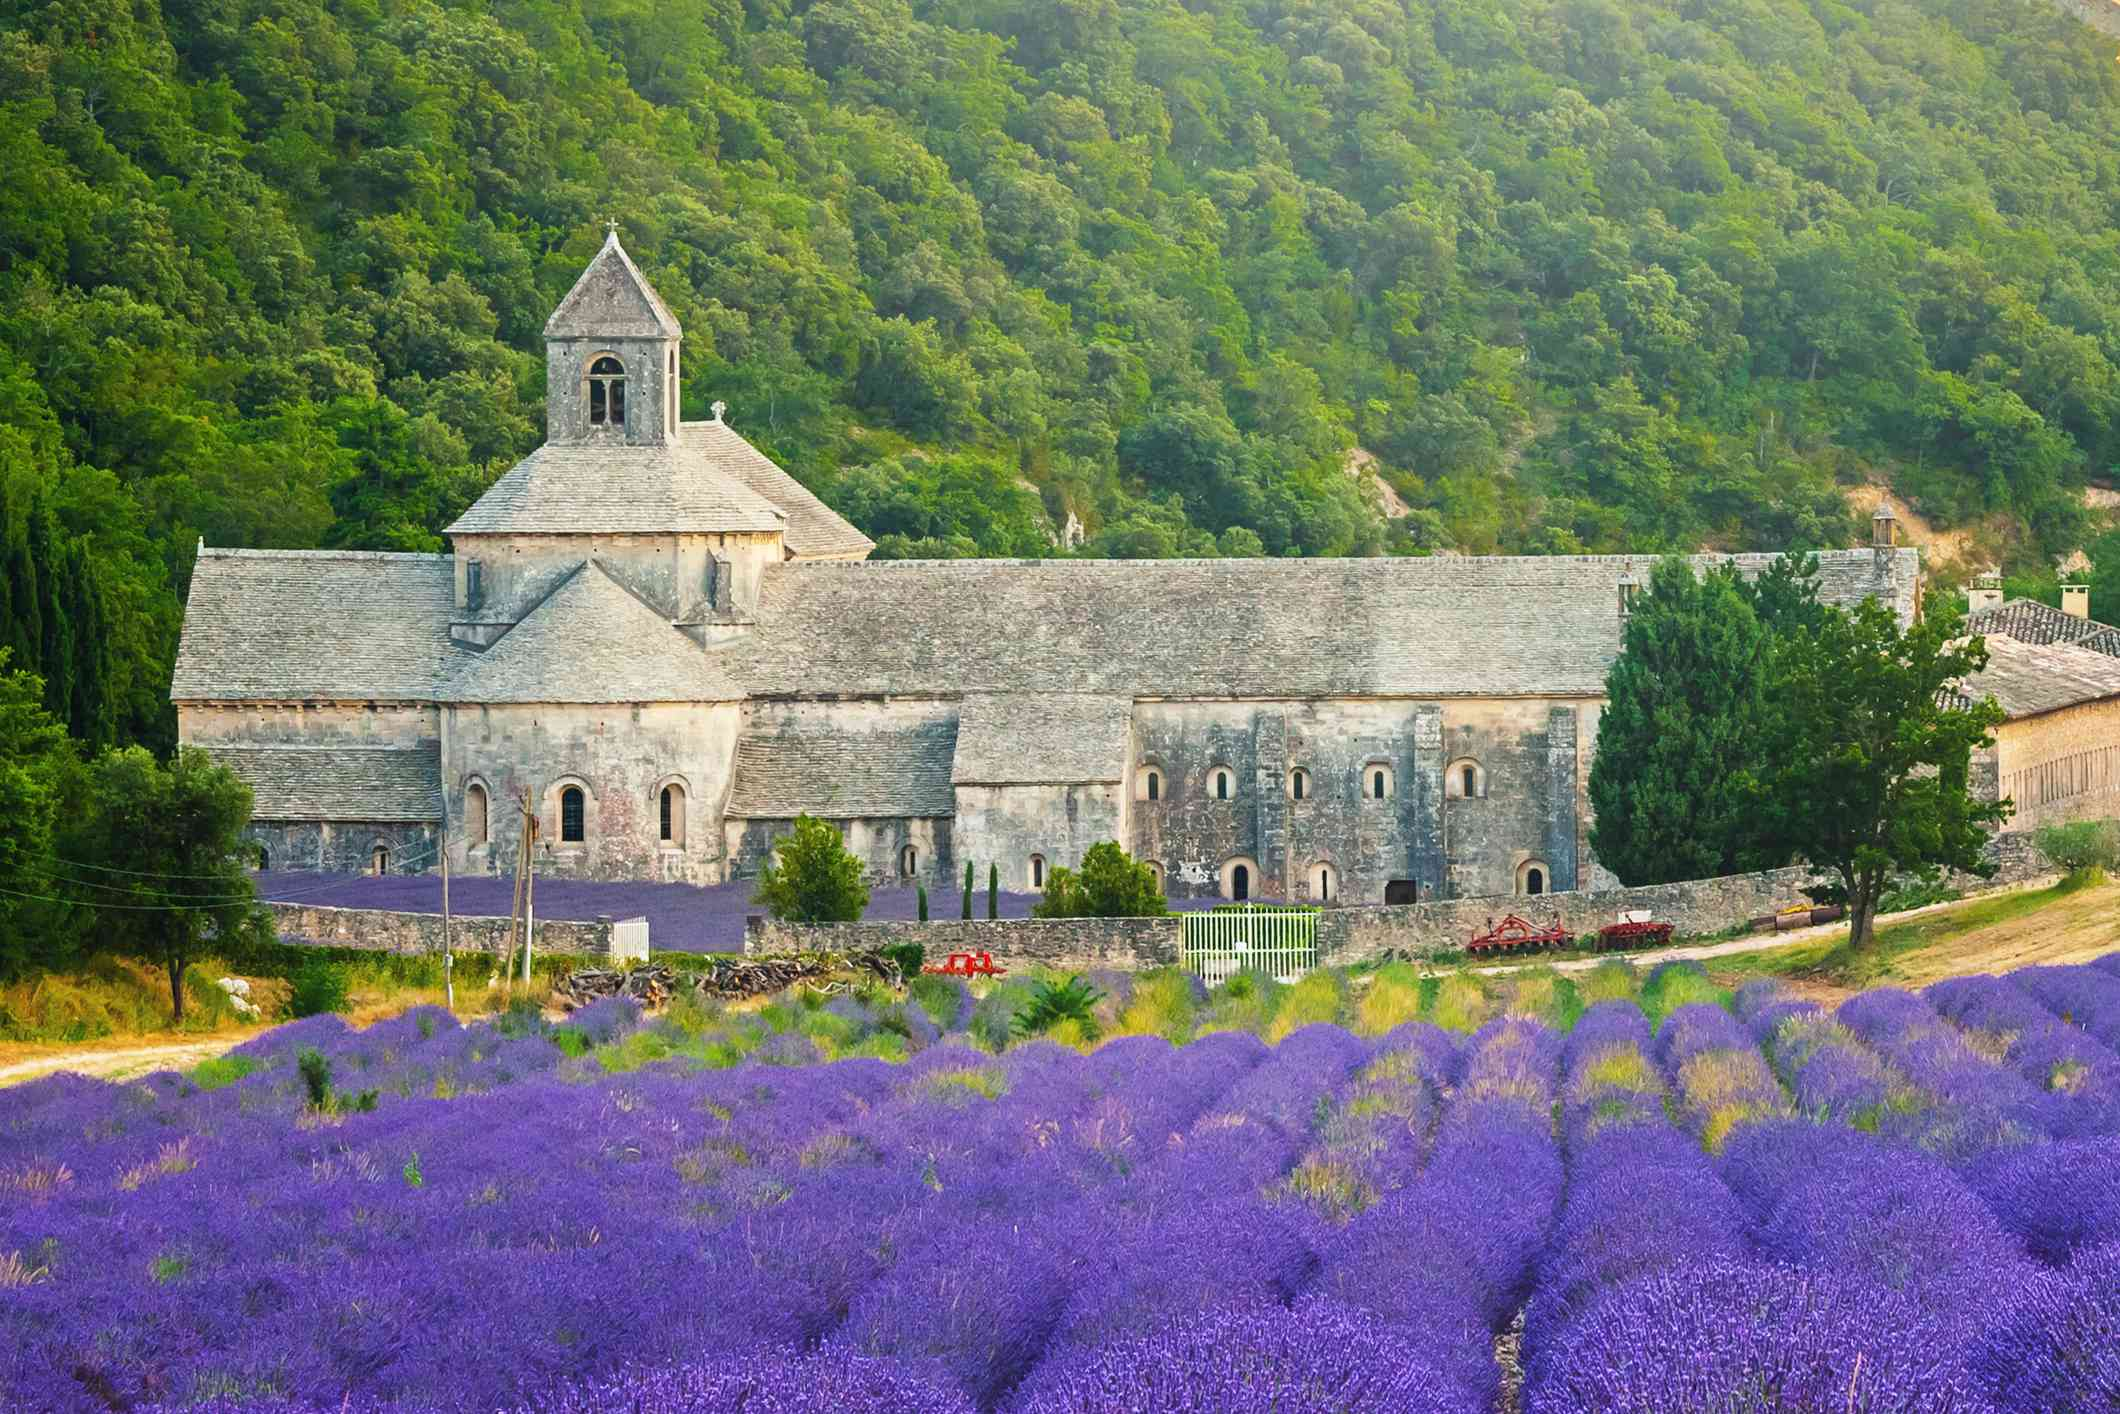 Gordes, Sénanque Abbey and lavender fields in France